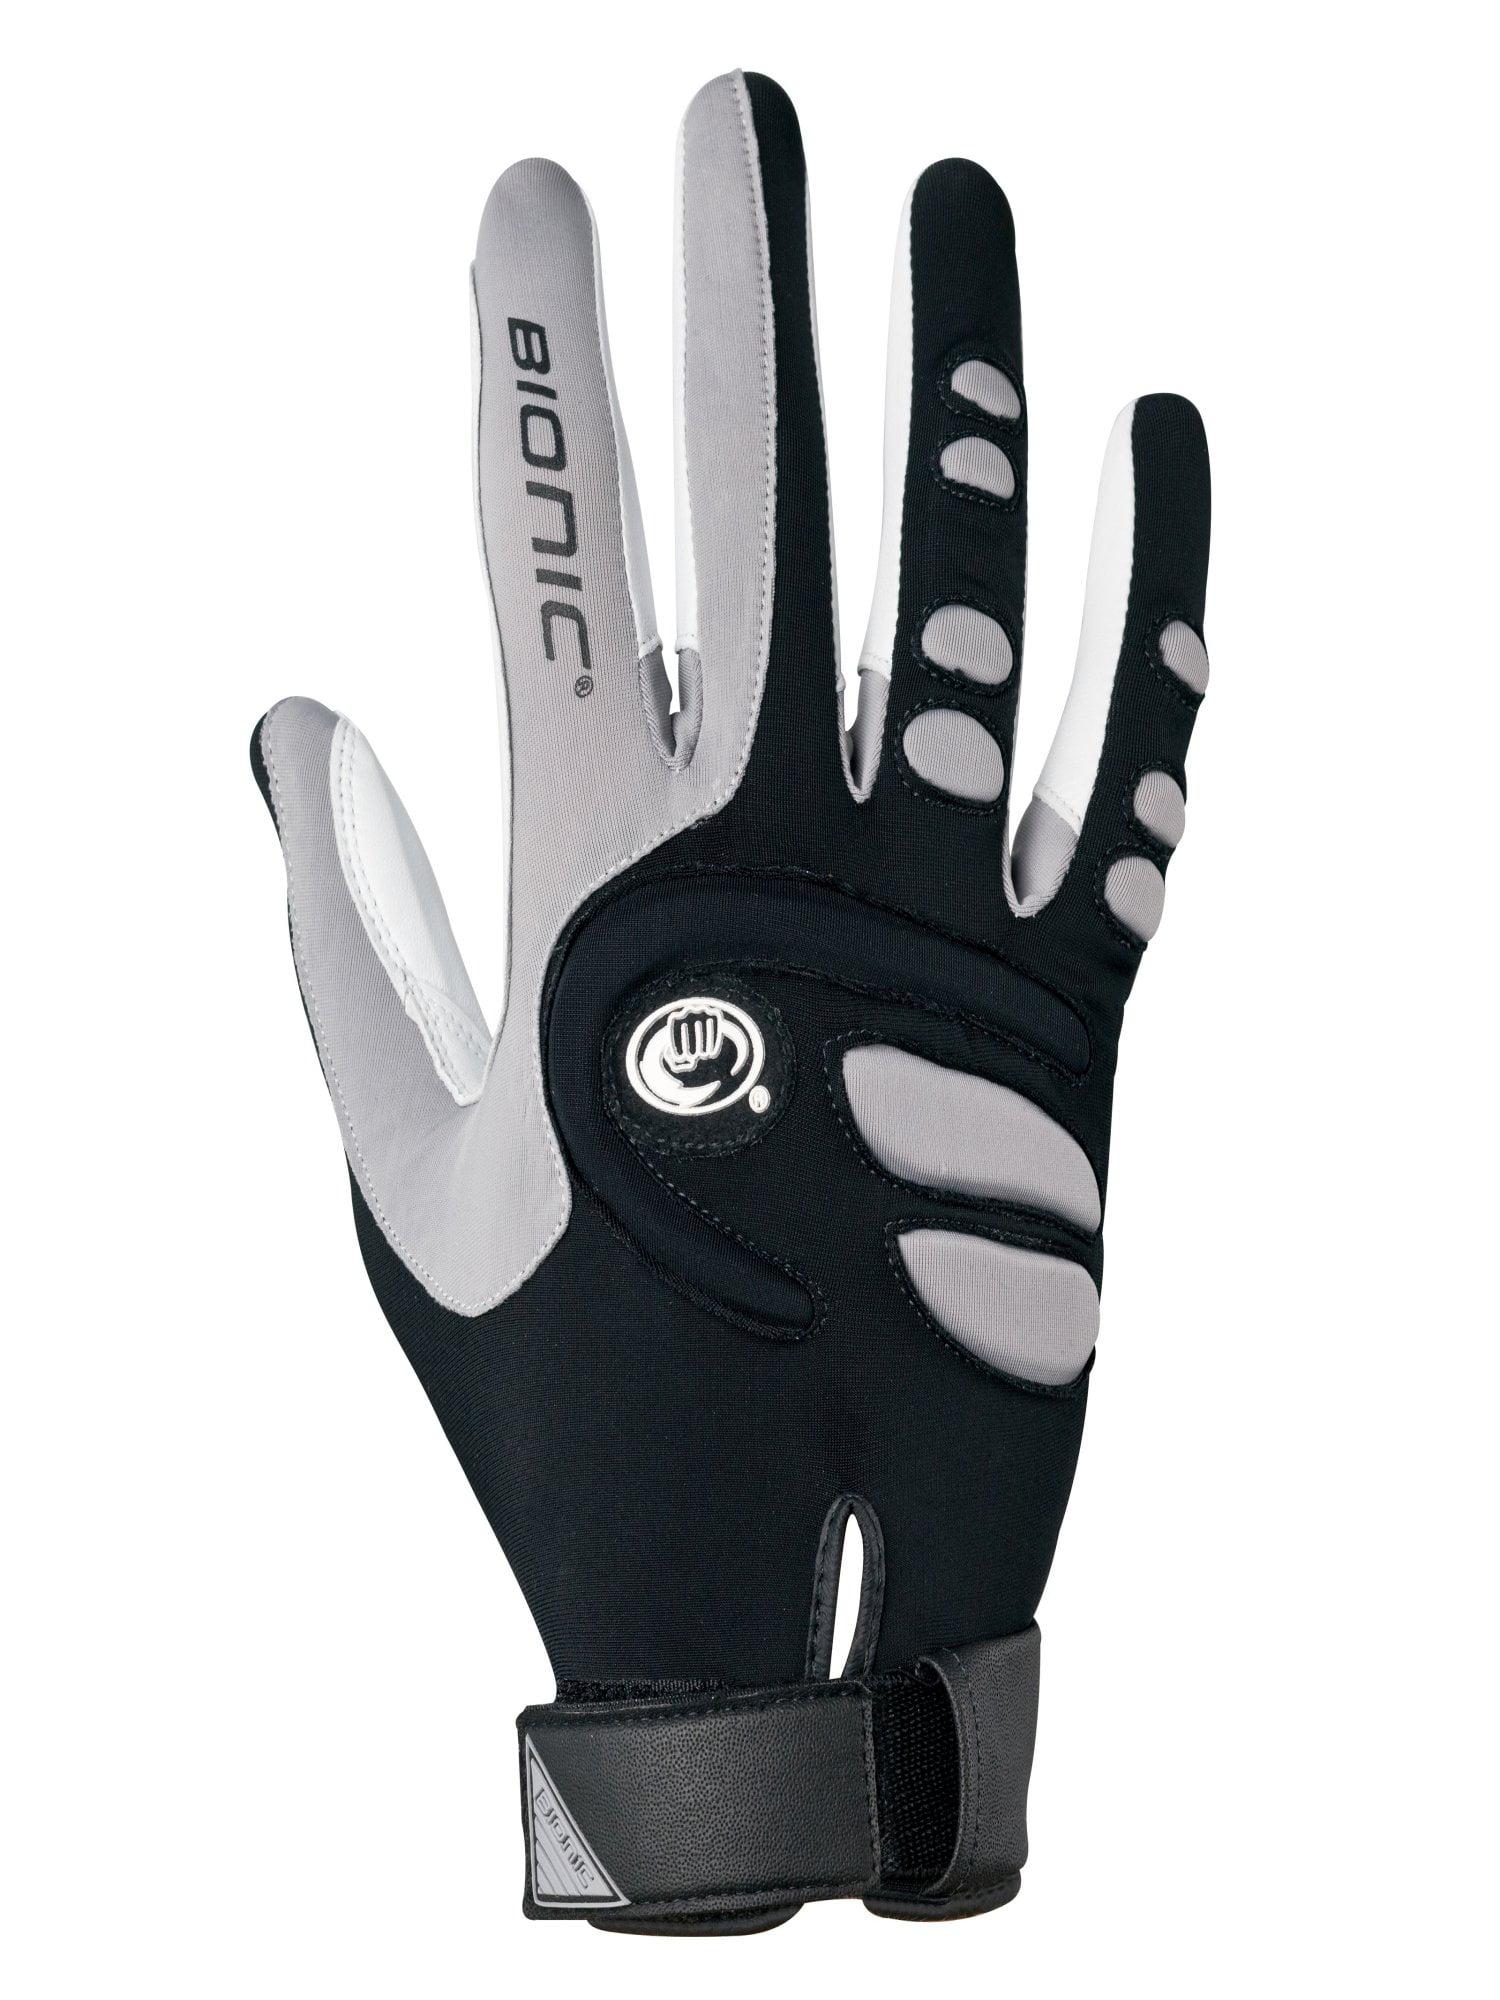 Bionic Men's Right Hand Racquetball Glove by Bionic Glove